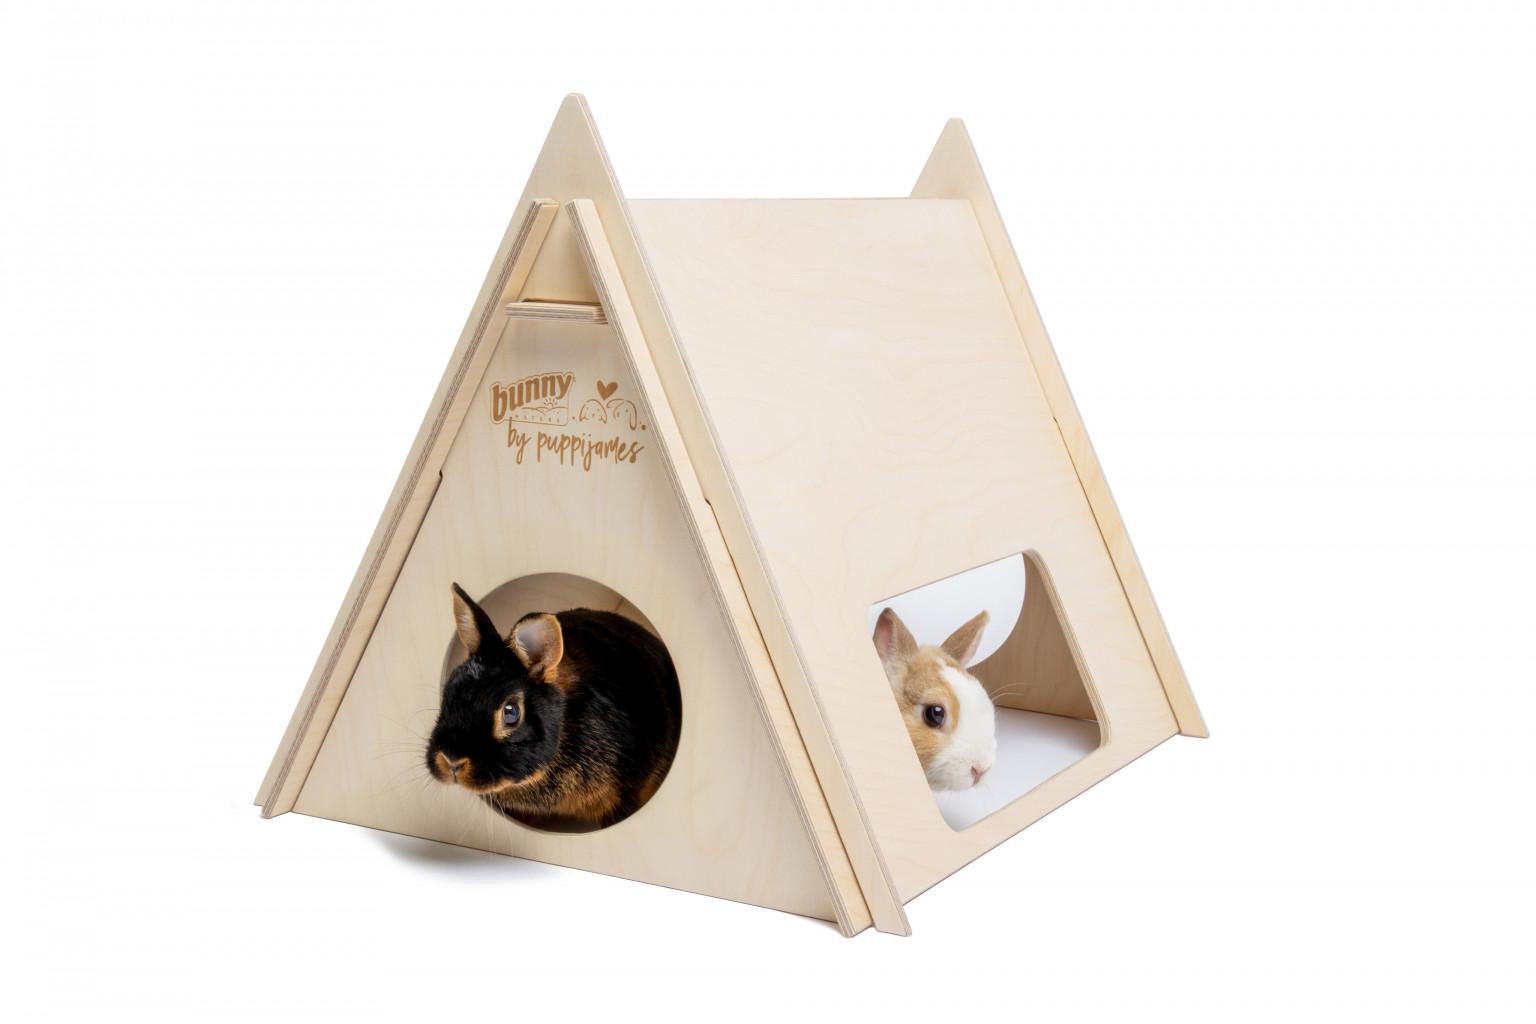 Tente de camping en bois bunny nature